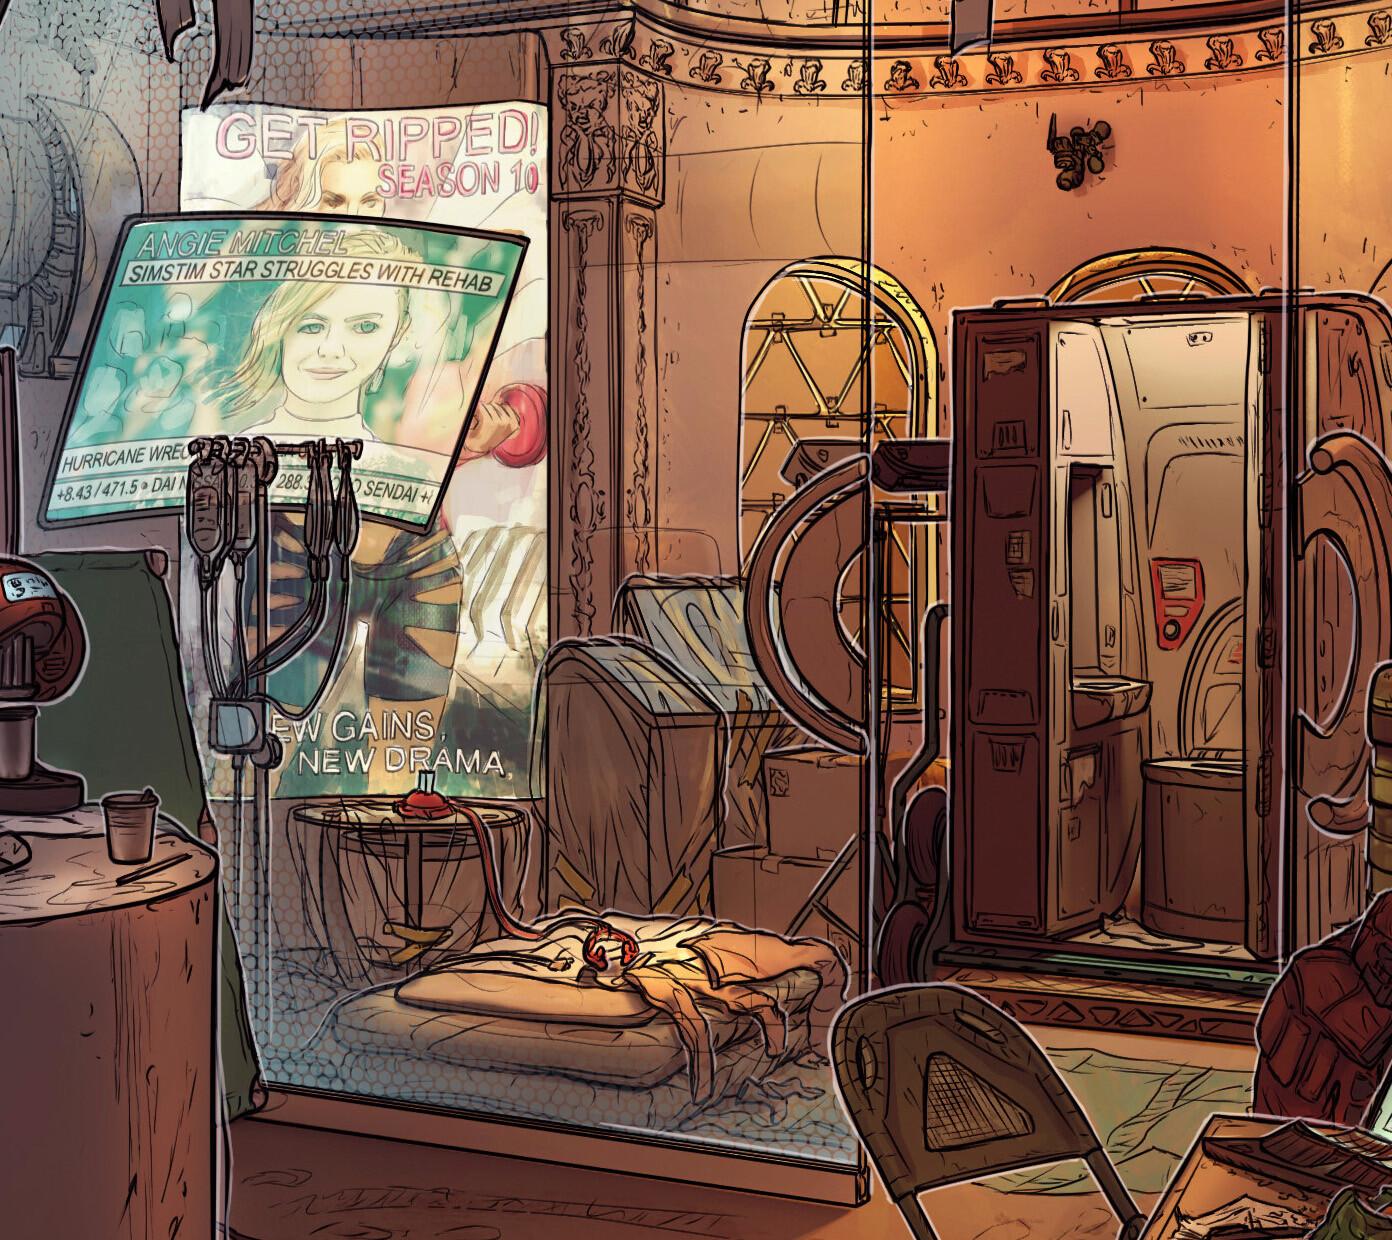 Details: Mona's room